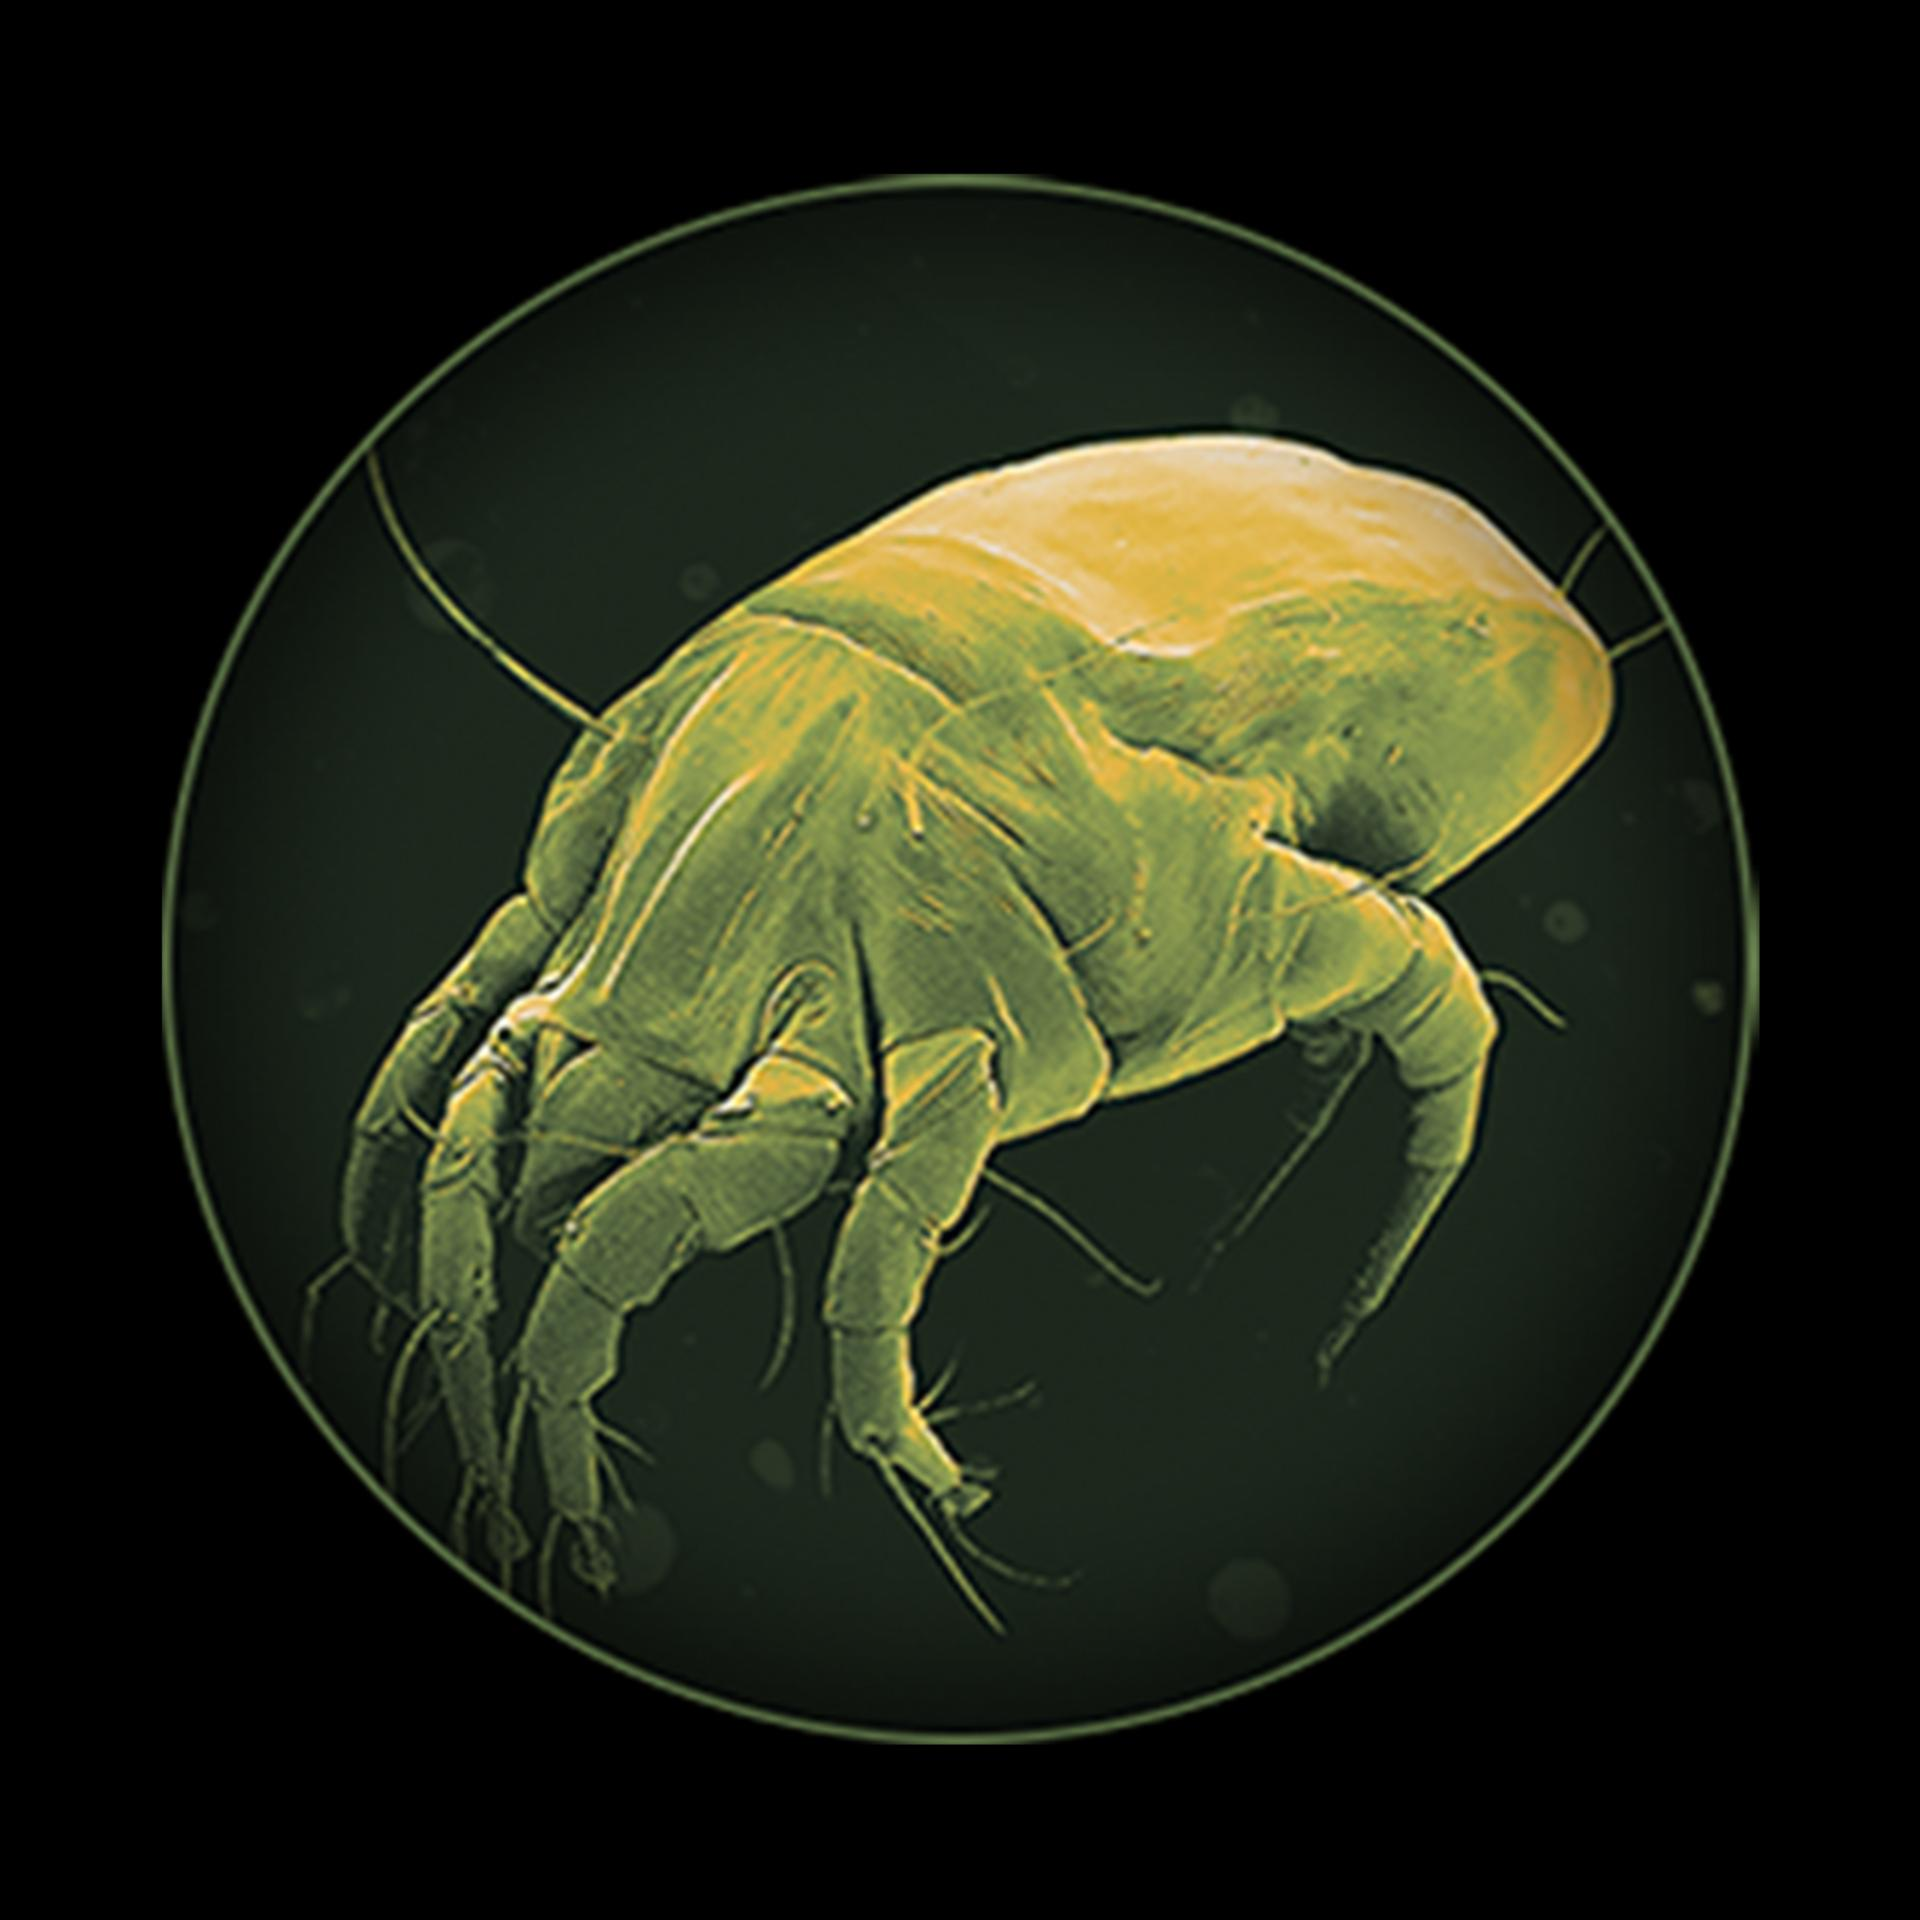 Dust mite under microscope